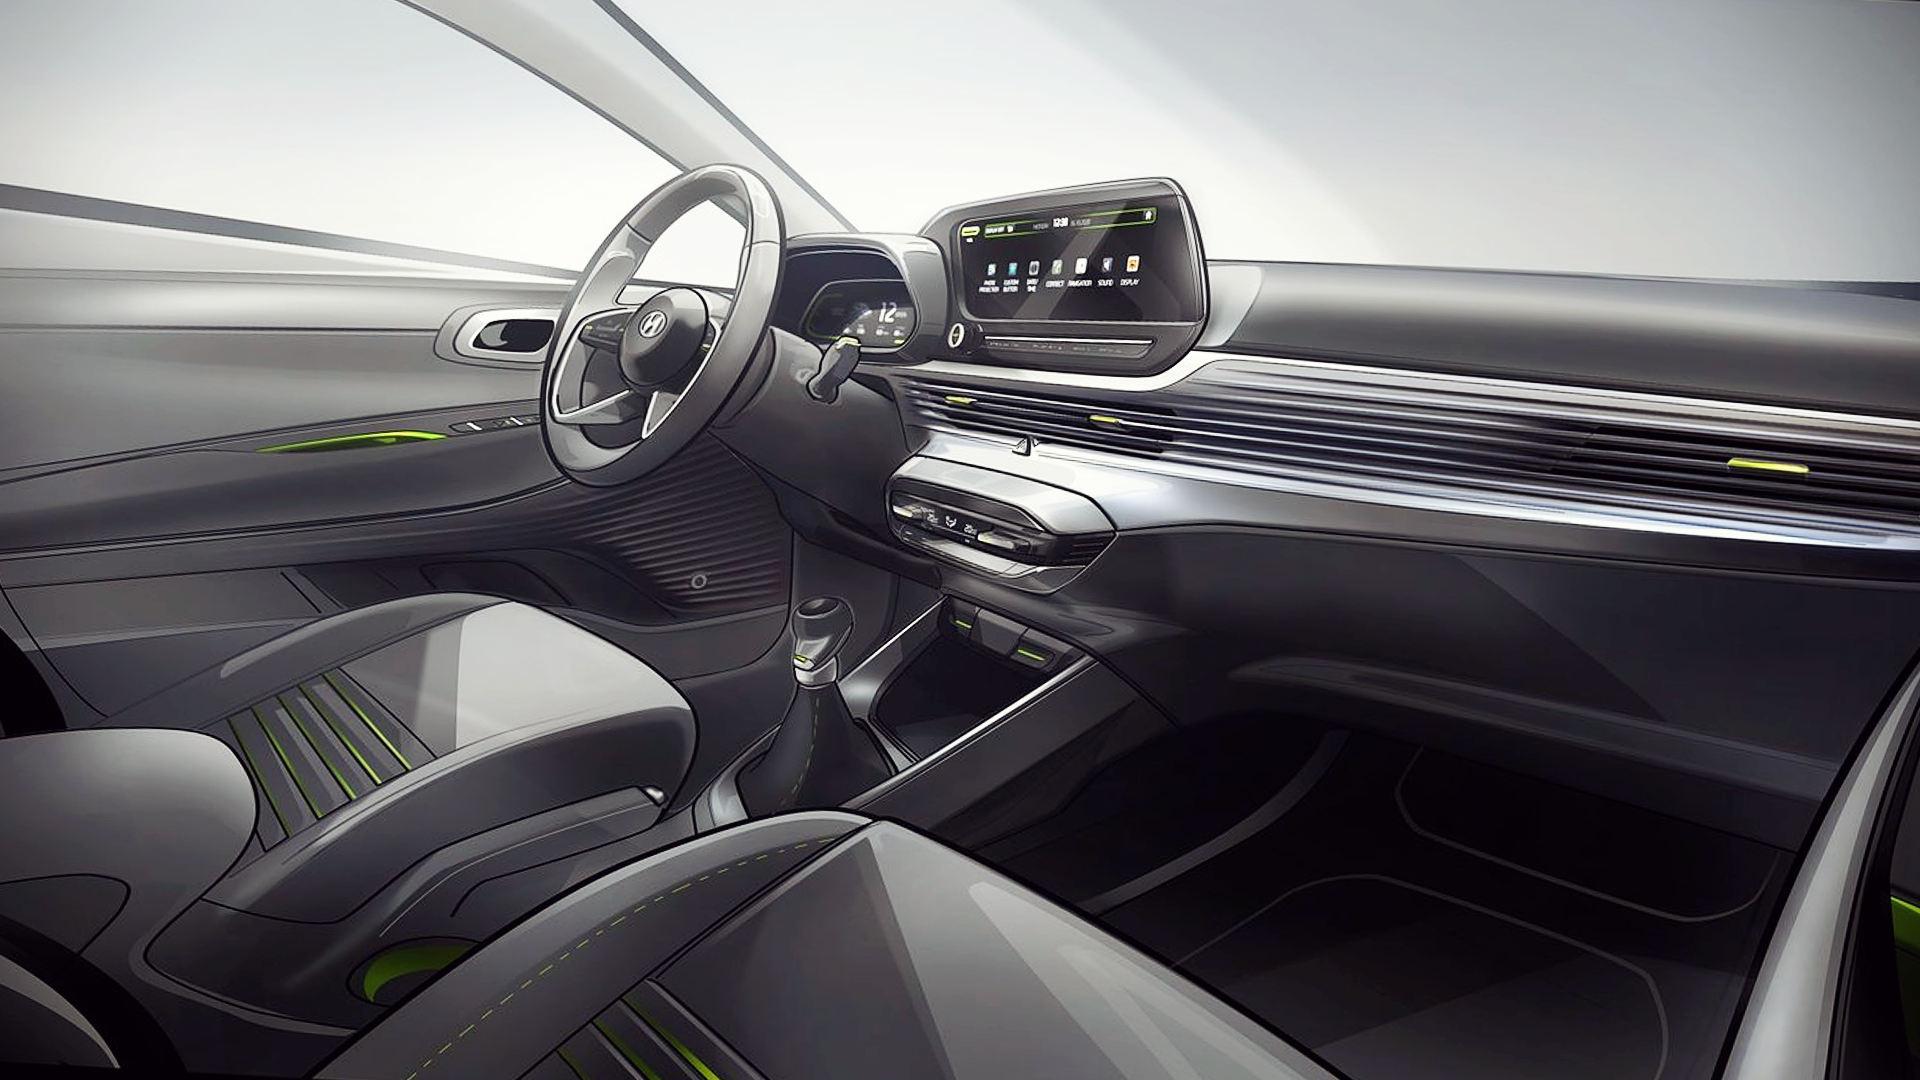 Hyundai i20 2021 Interior Wallpaper